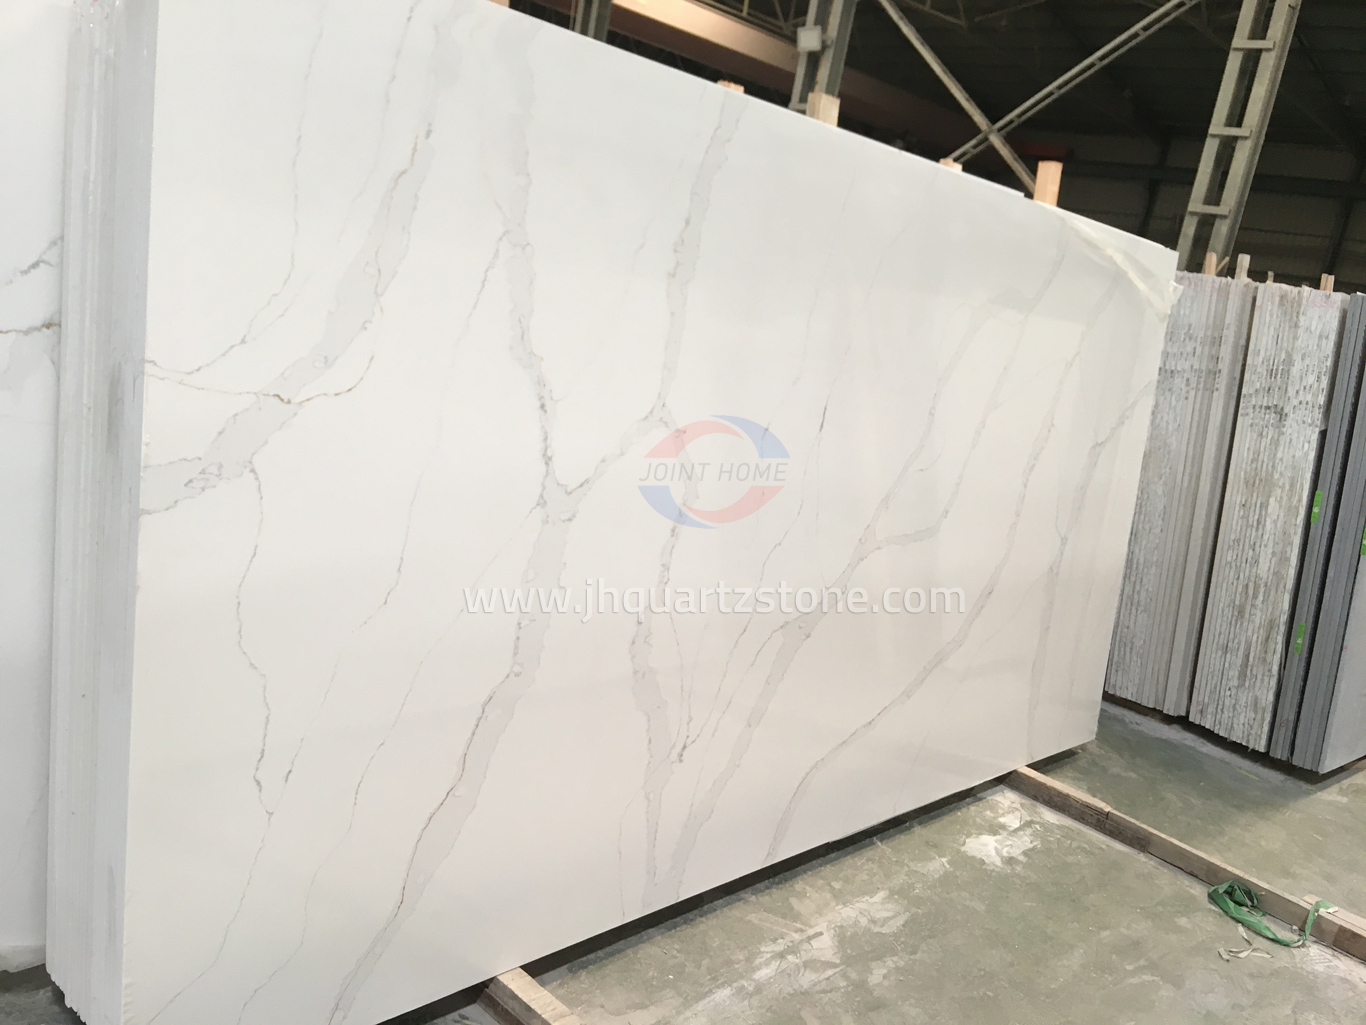 How To Import Quartz Stone Slabs? Knowledge